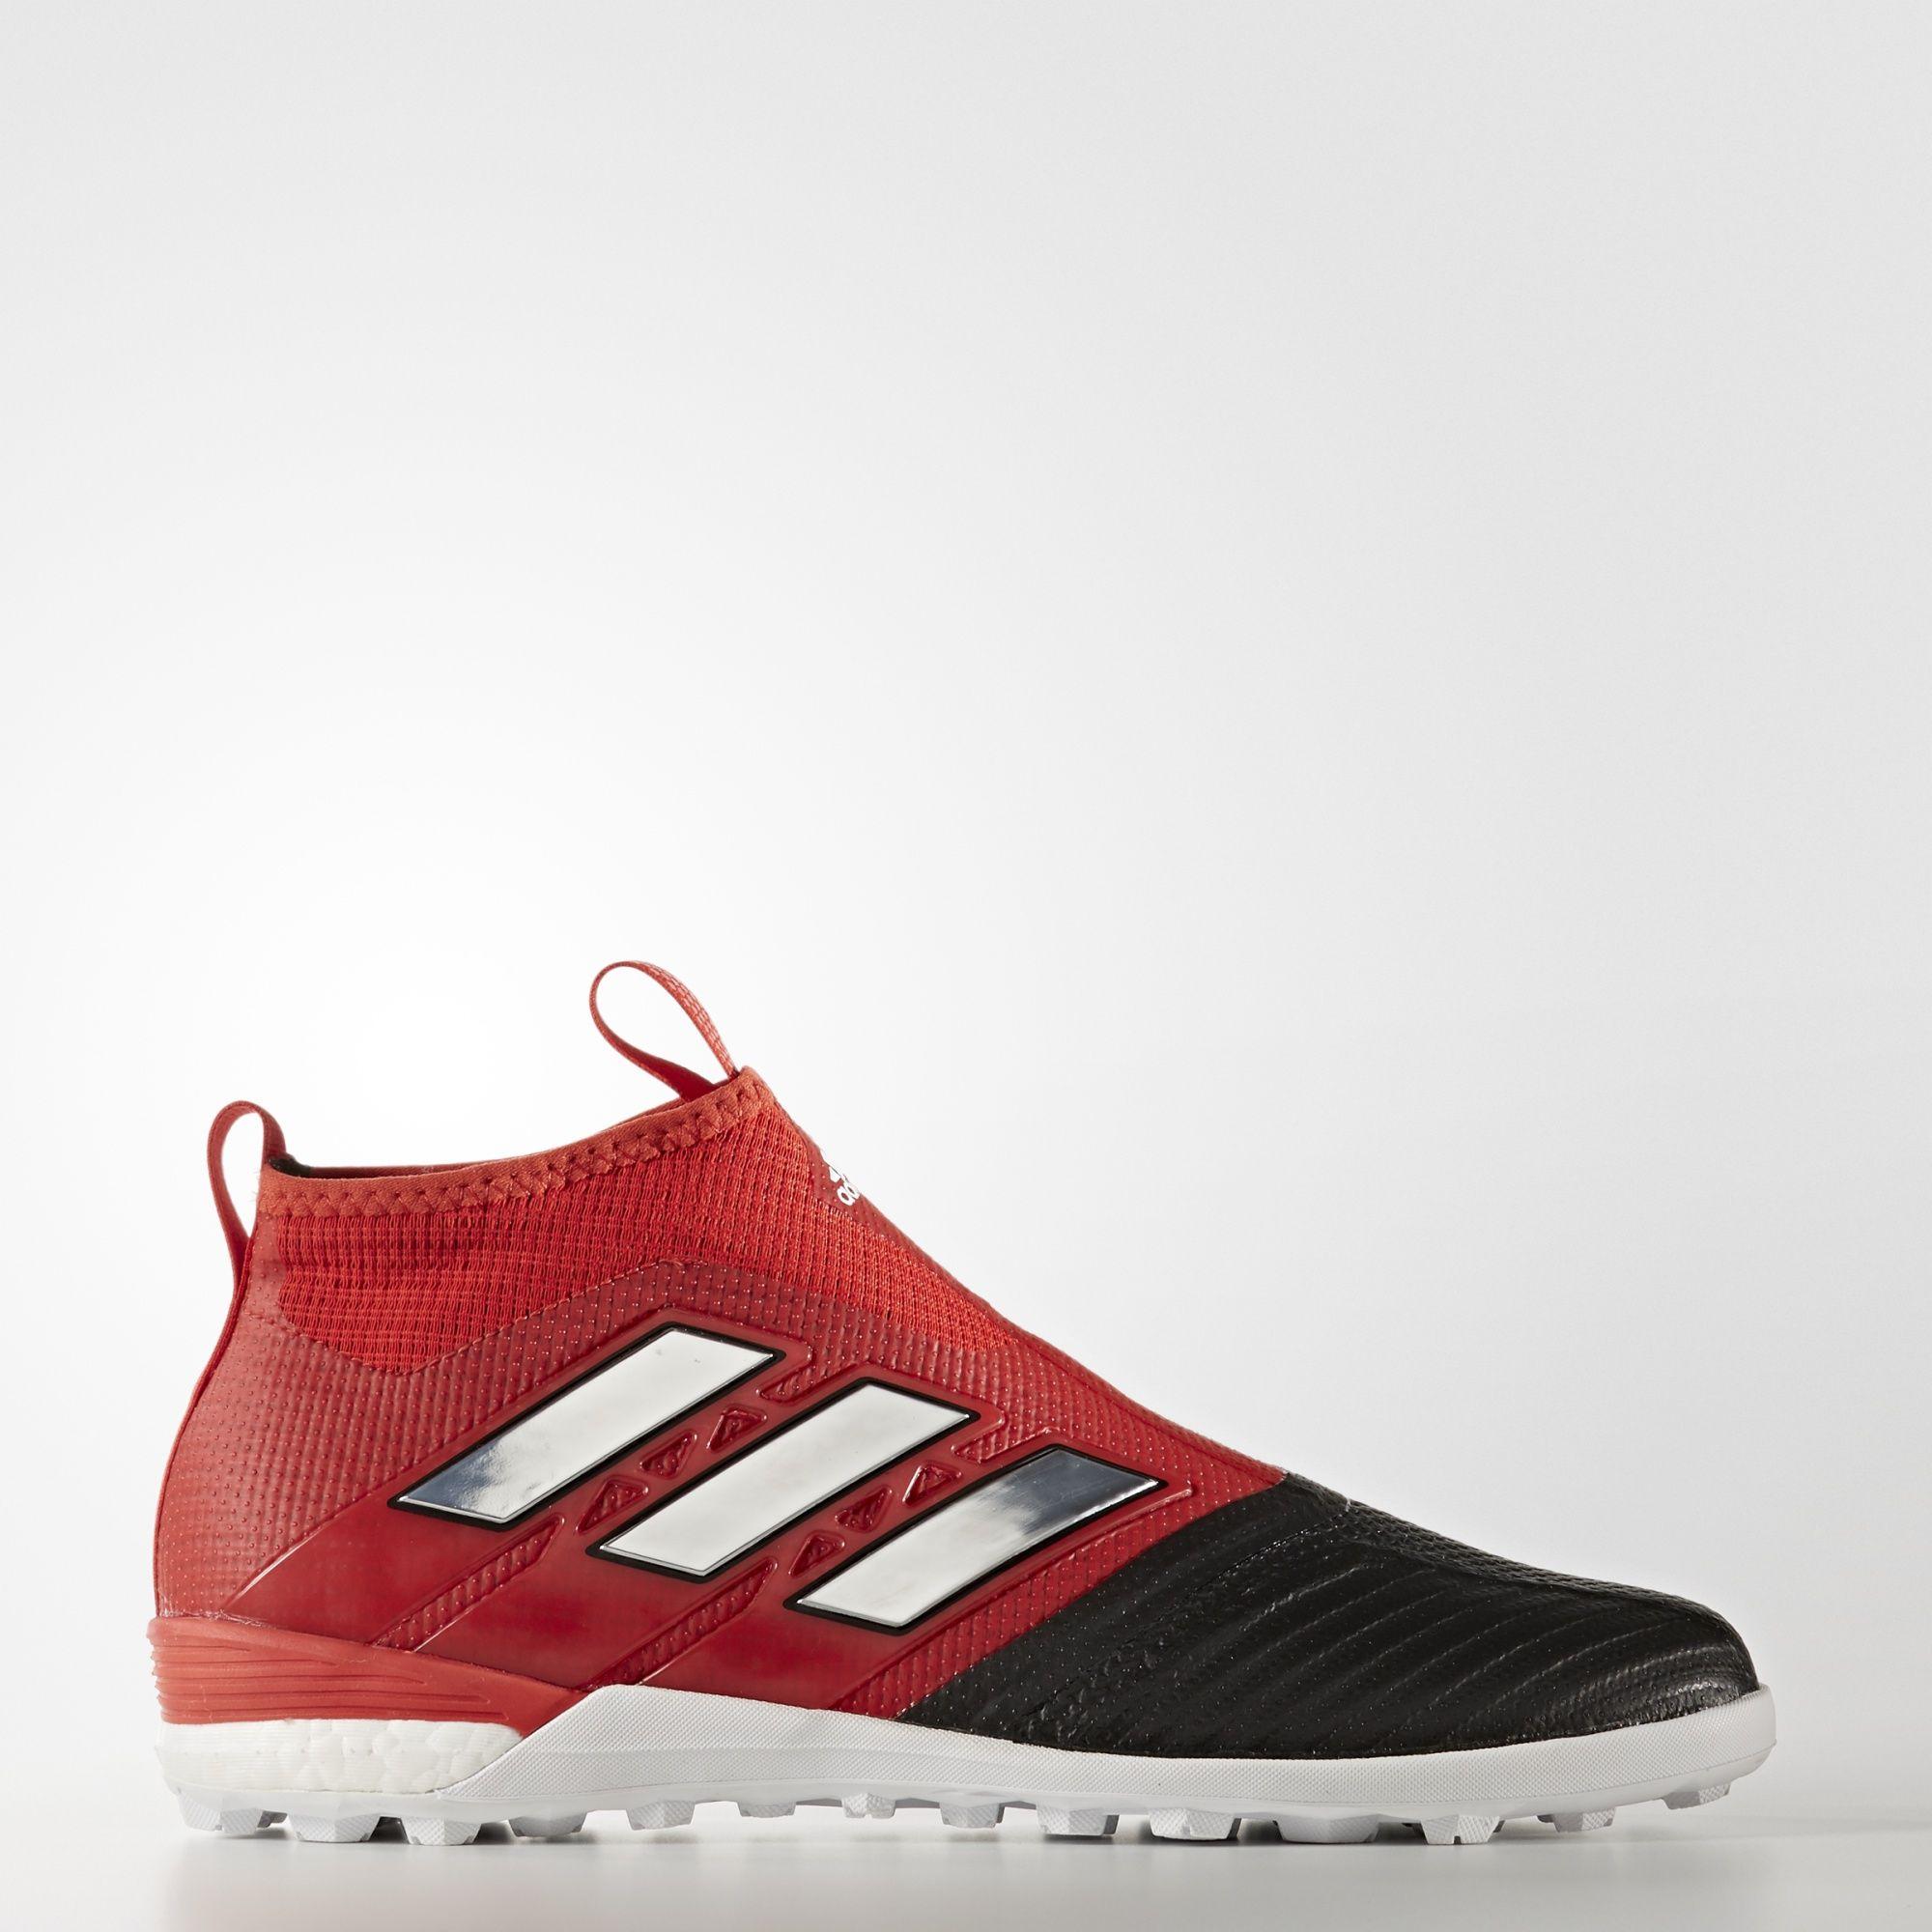 Adidas Ace Tango 17+ Purecontrol TF - Soccer Premier